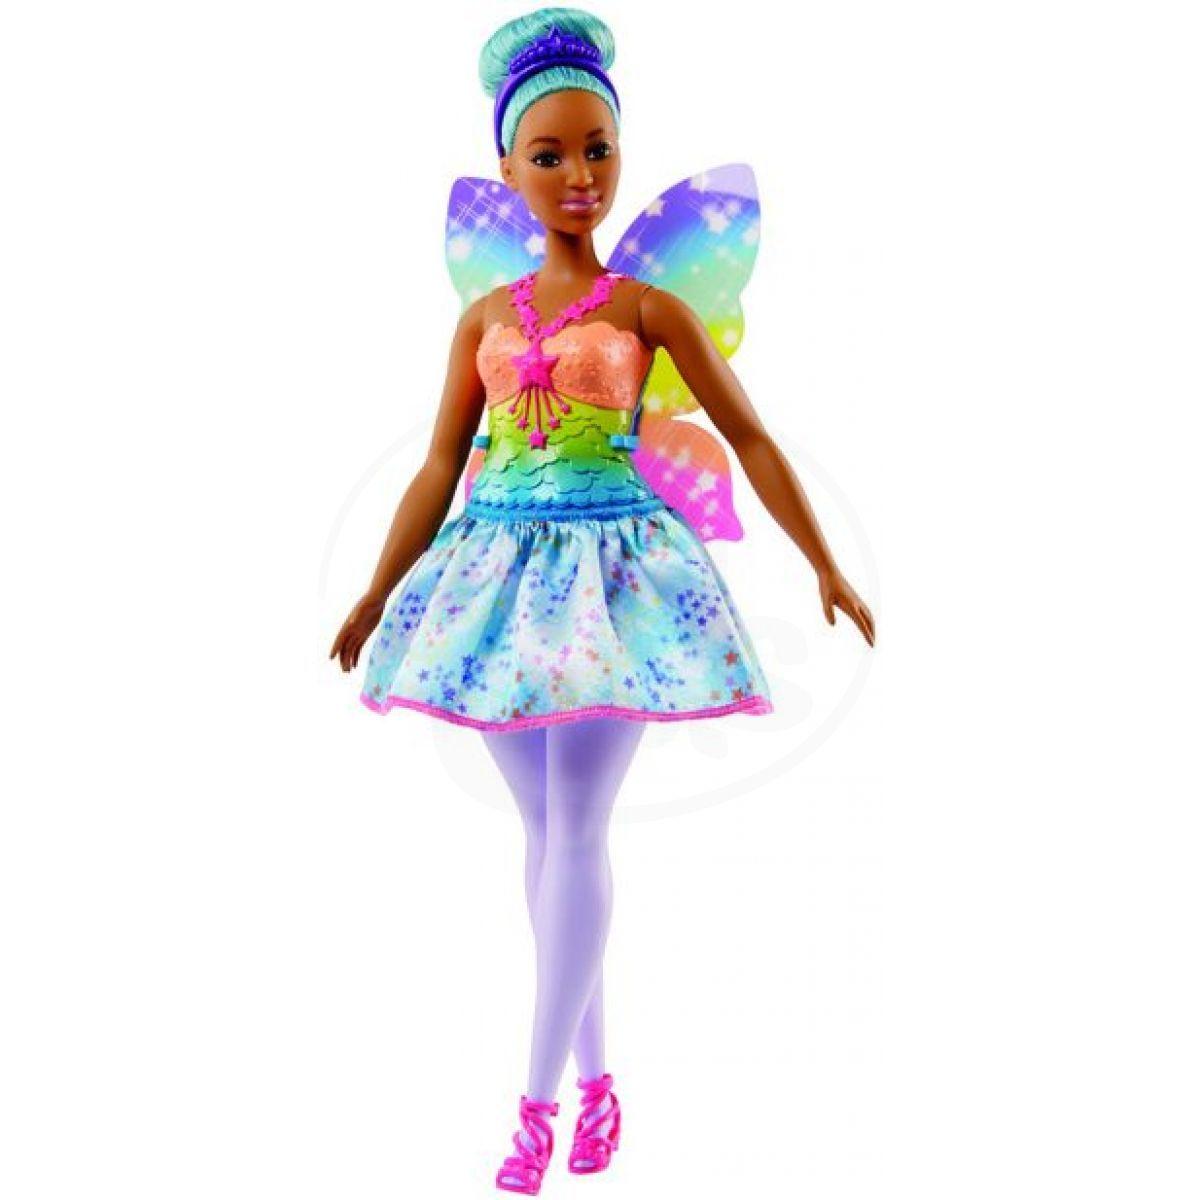 082497f0d46c Mattel Barbie Víla Zelené vlasy